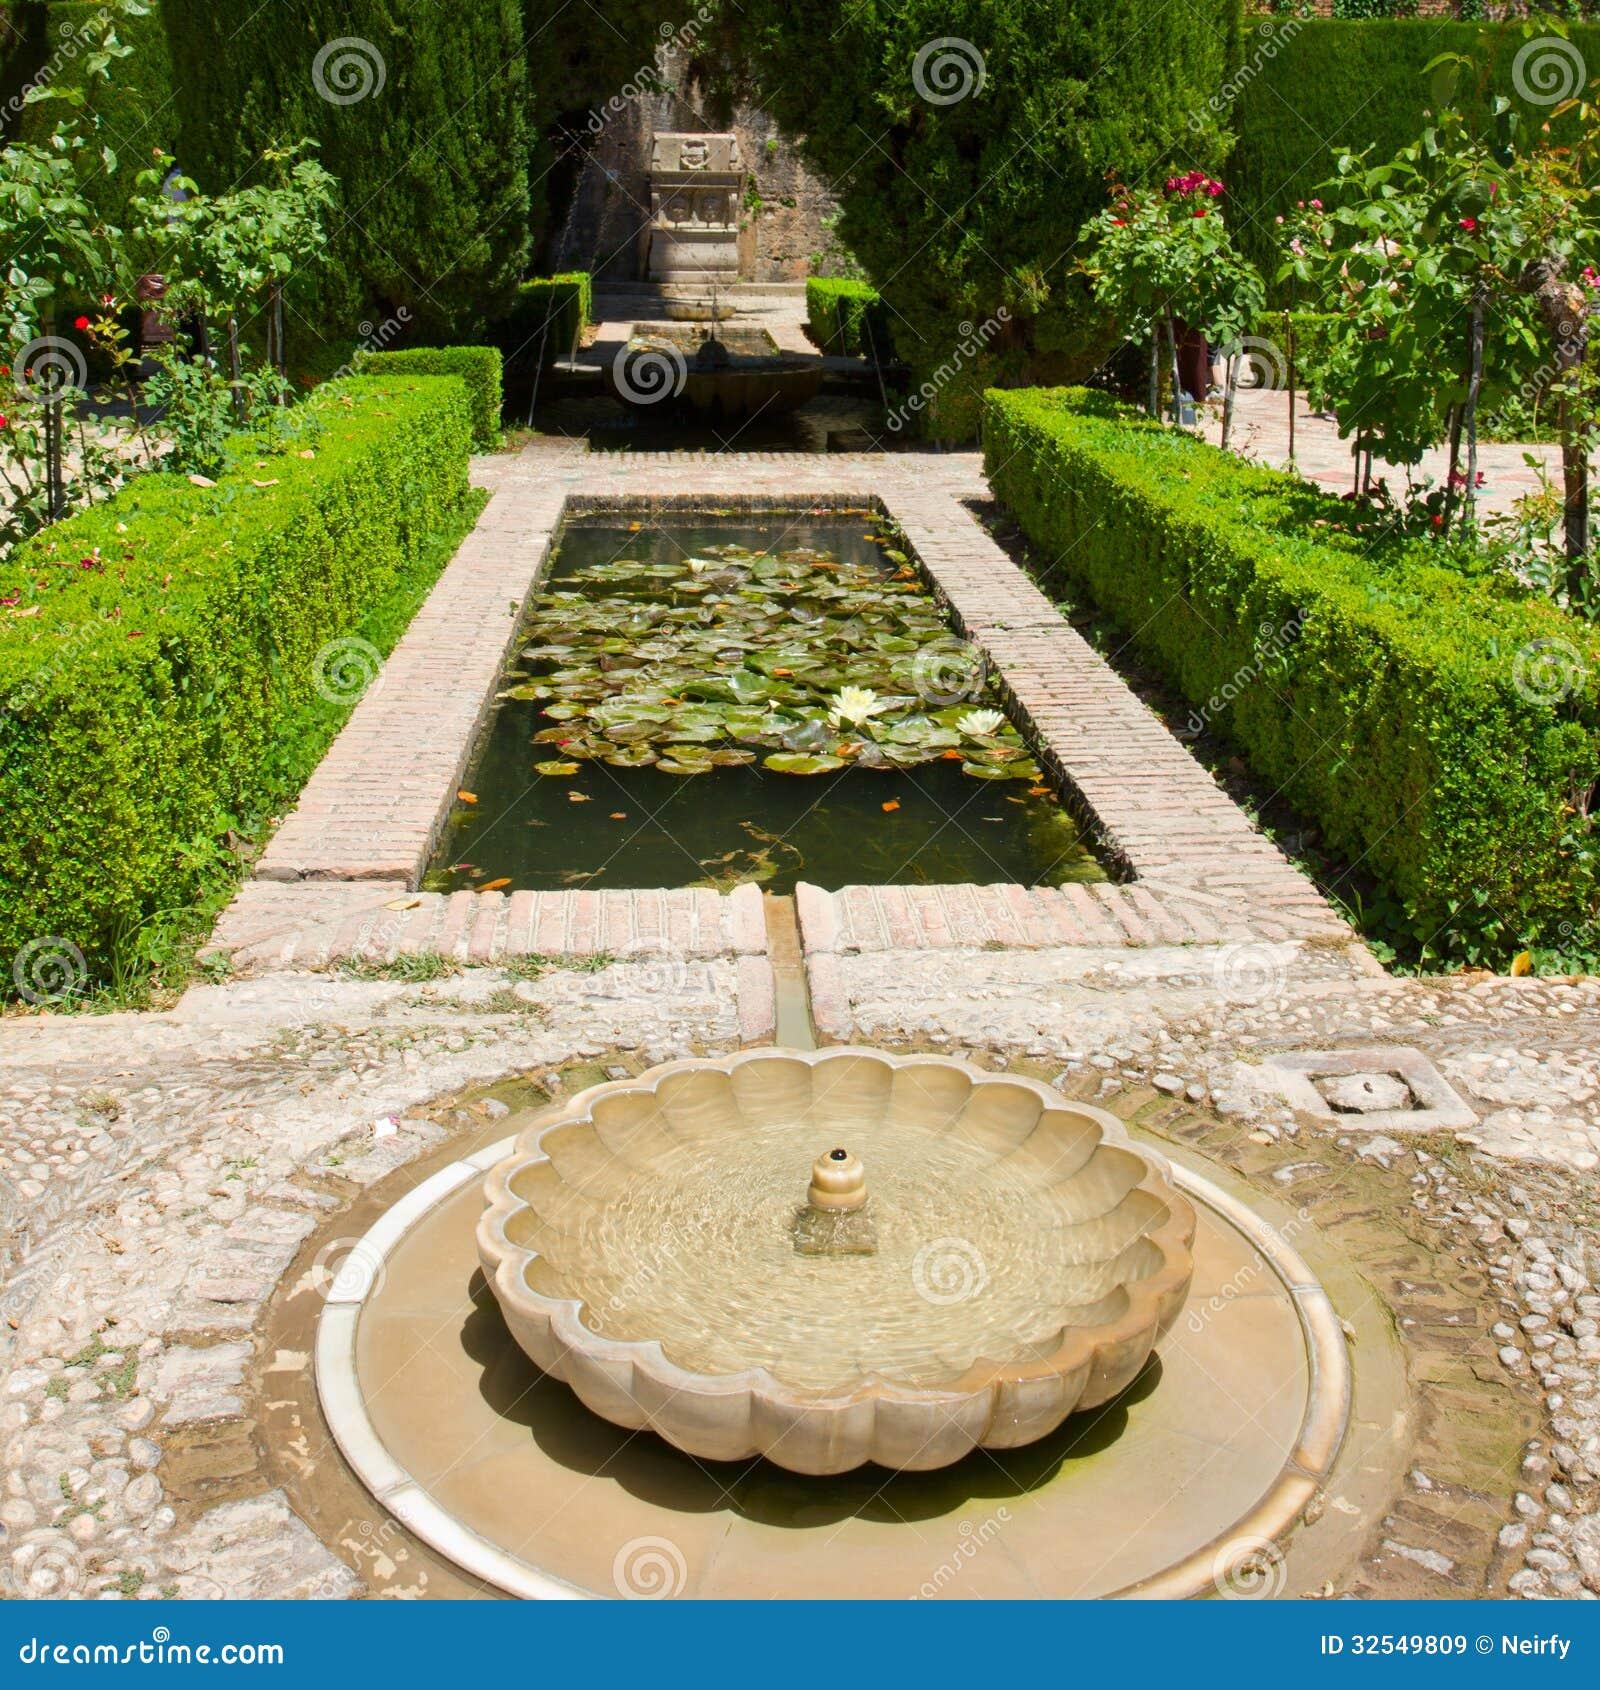 Generalife gardens granada royalty free stock images for Generalife gardens